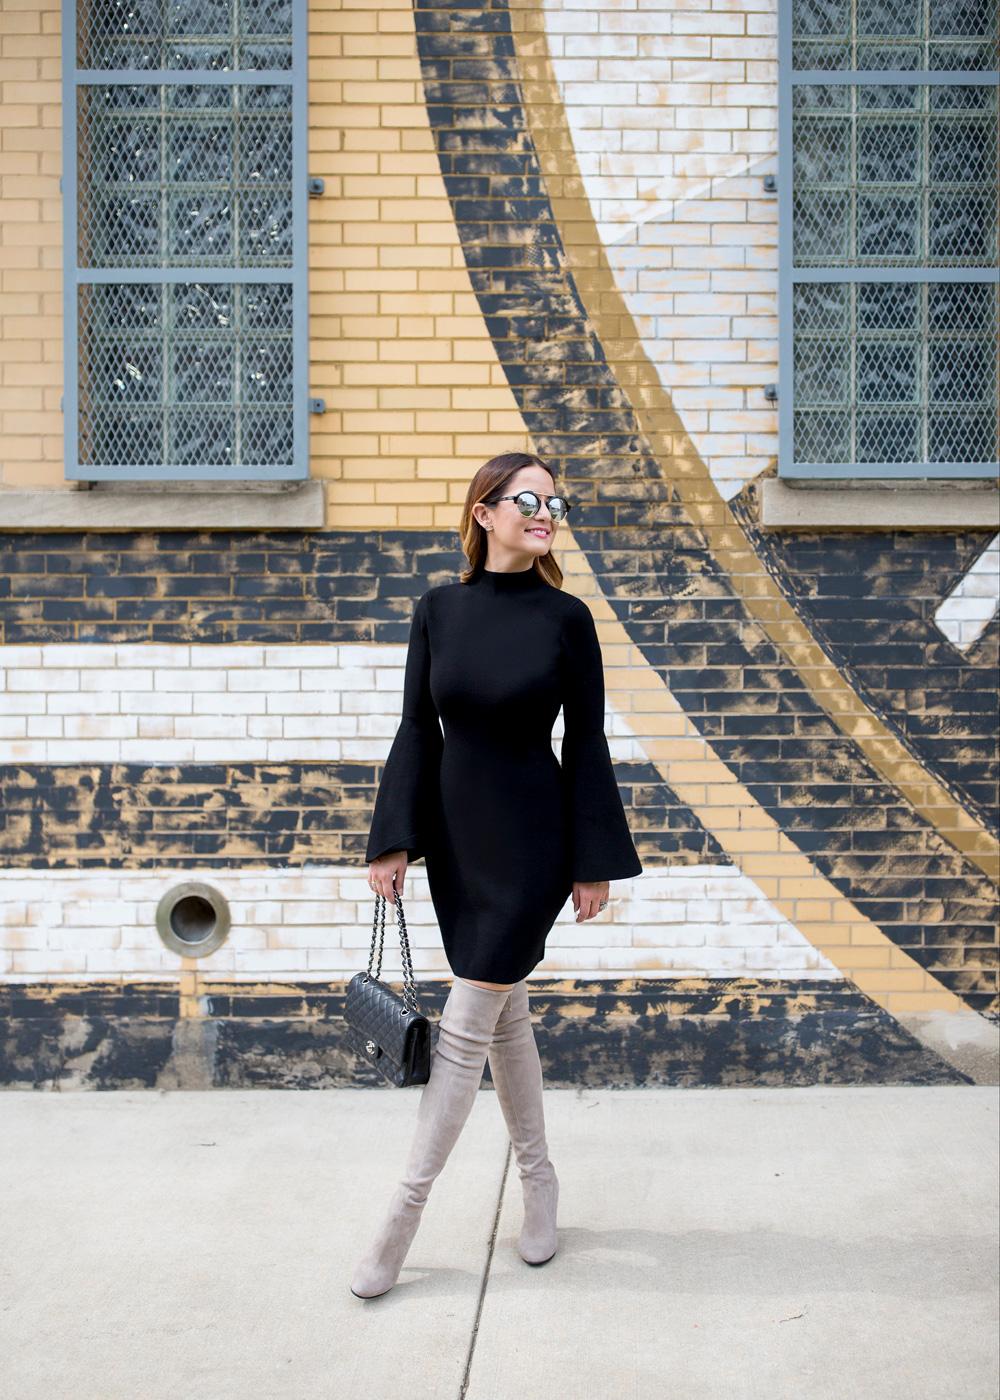 Chicago Fashion Blogger